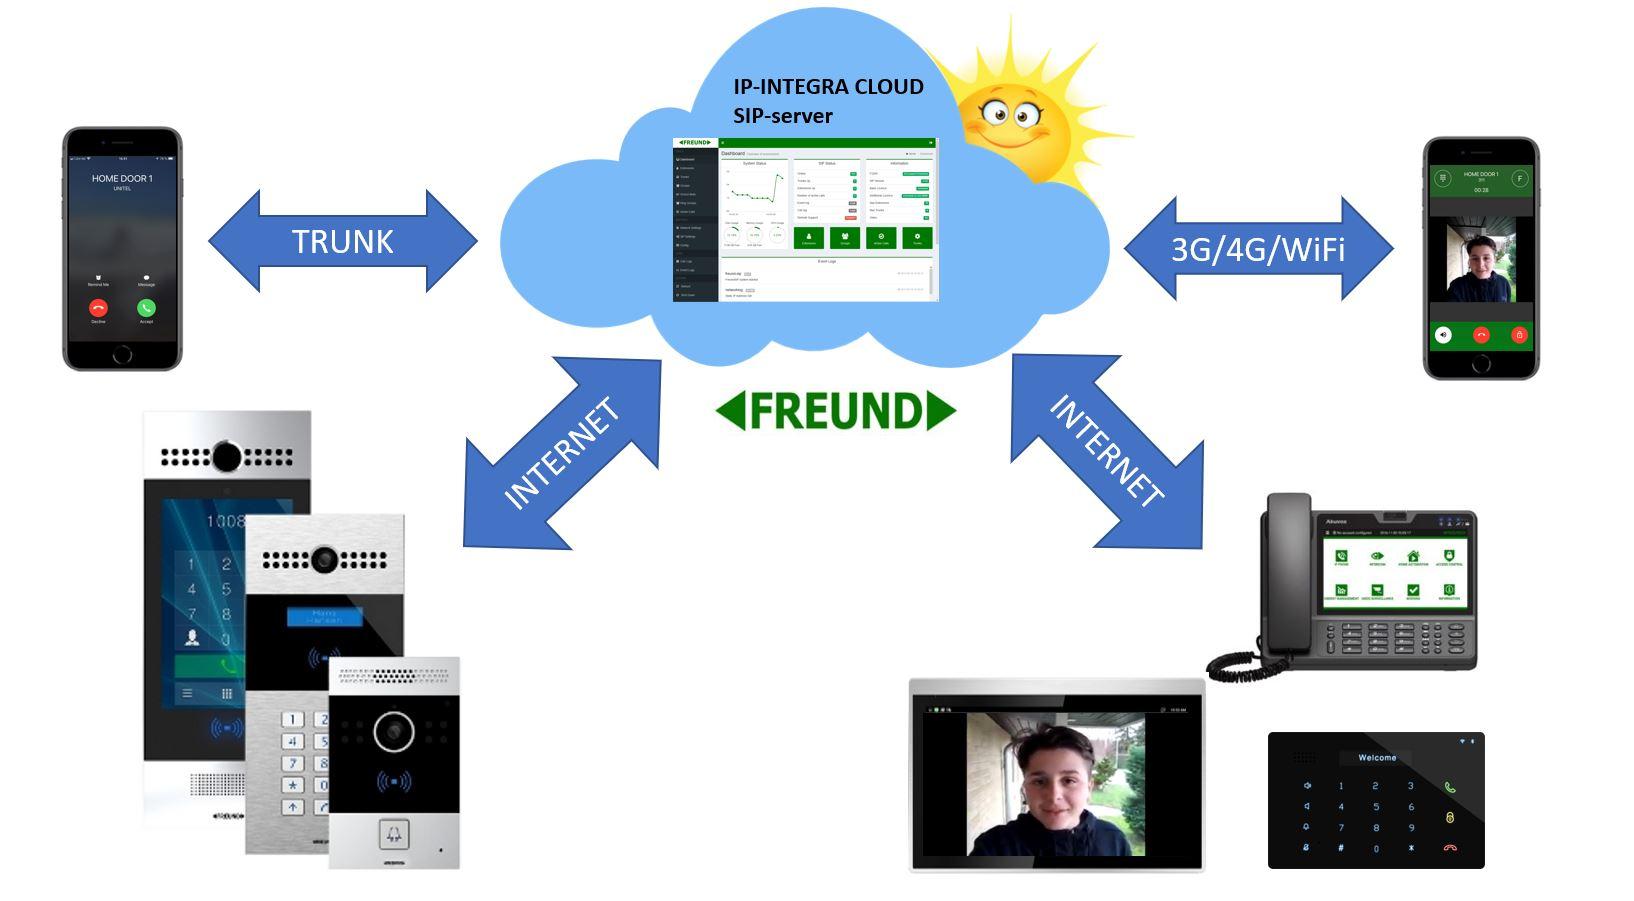 IP-INTEGRA Cloud